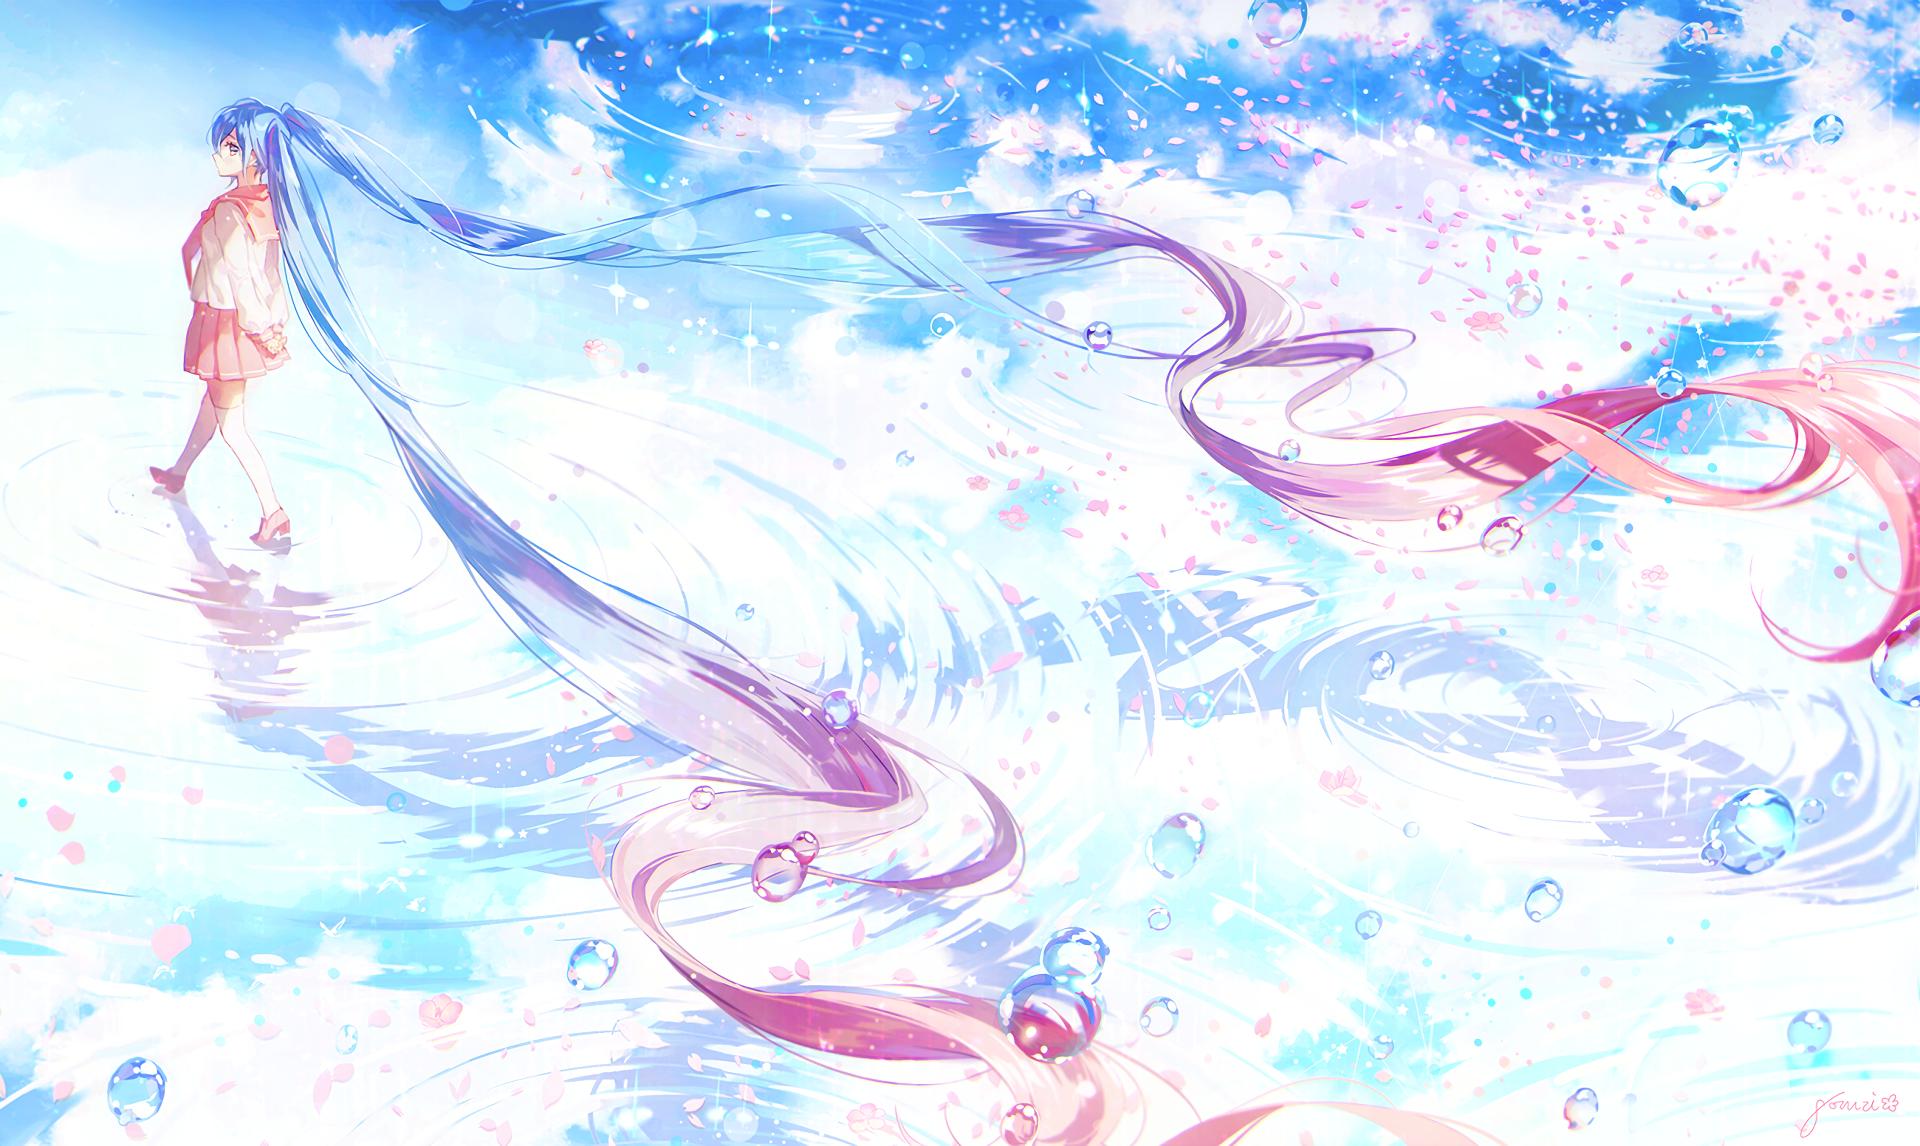 Anime - Vocaloid  Girl Hatsune Miku Long Hair Bubble School Uniform Petal Reflection Water Twintails Skirt Anime Wallpaper